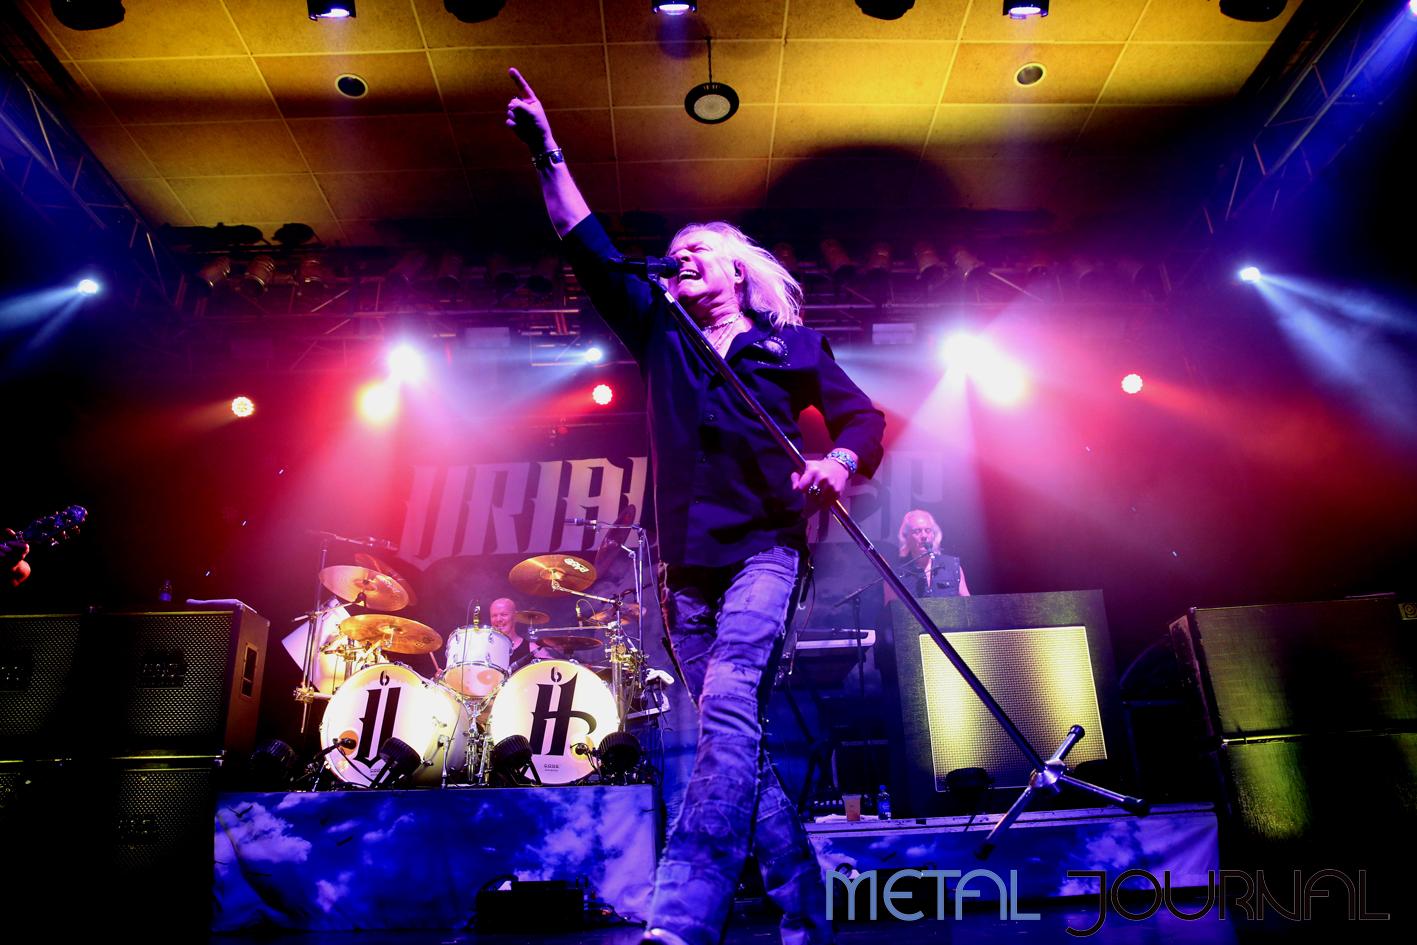 uriah heep - metal journal 2019 pic 3